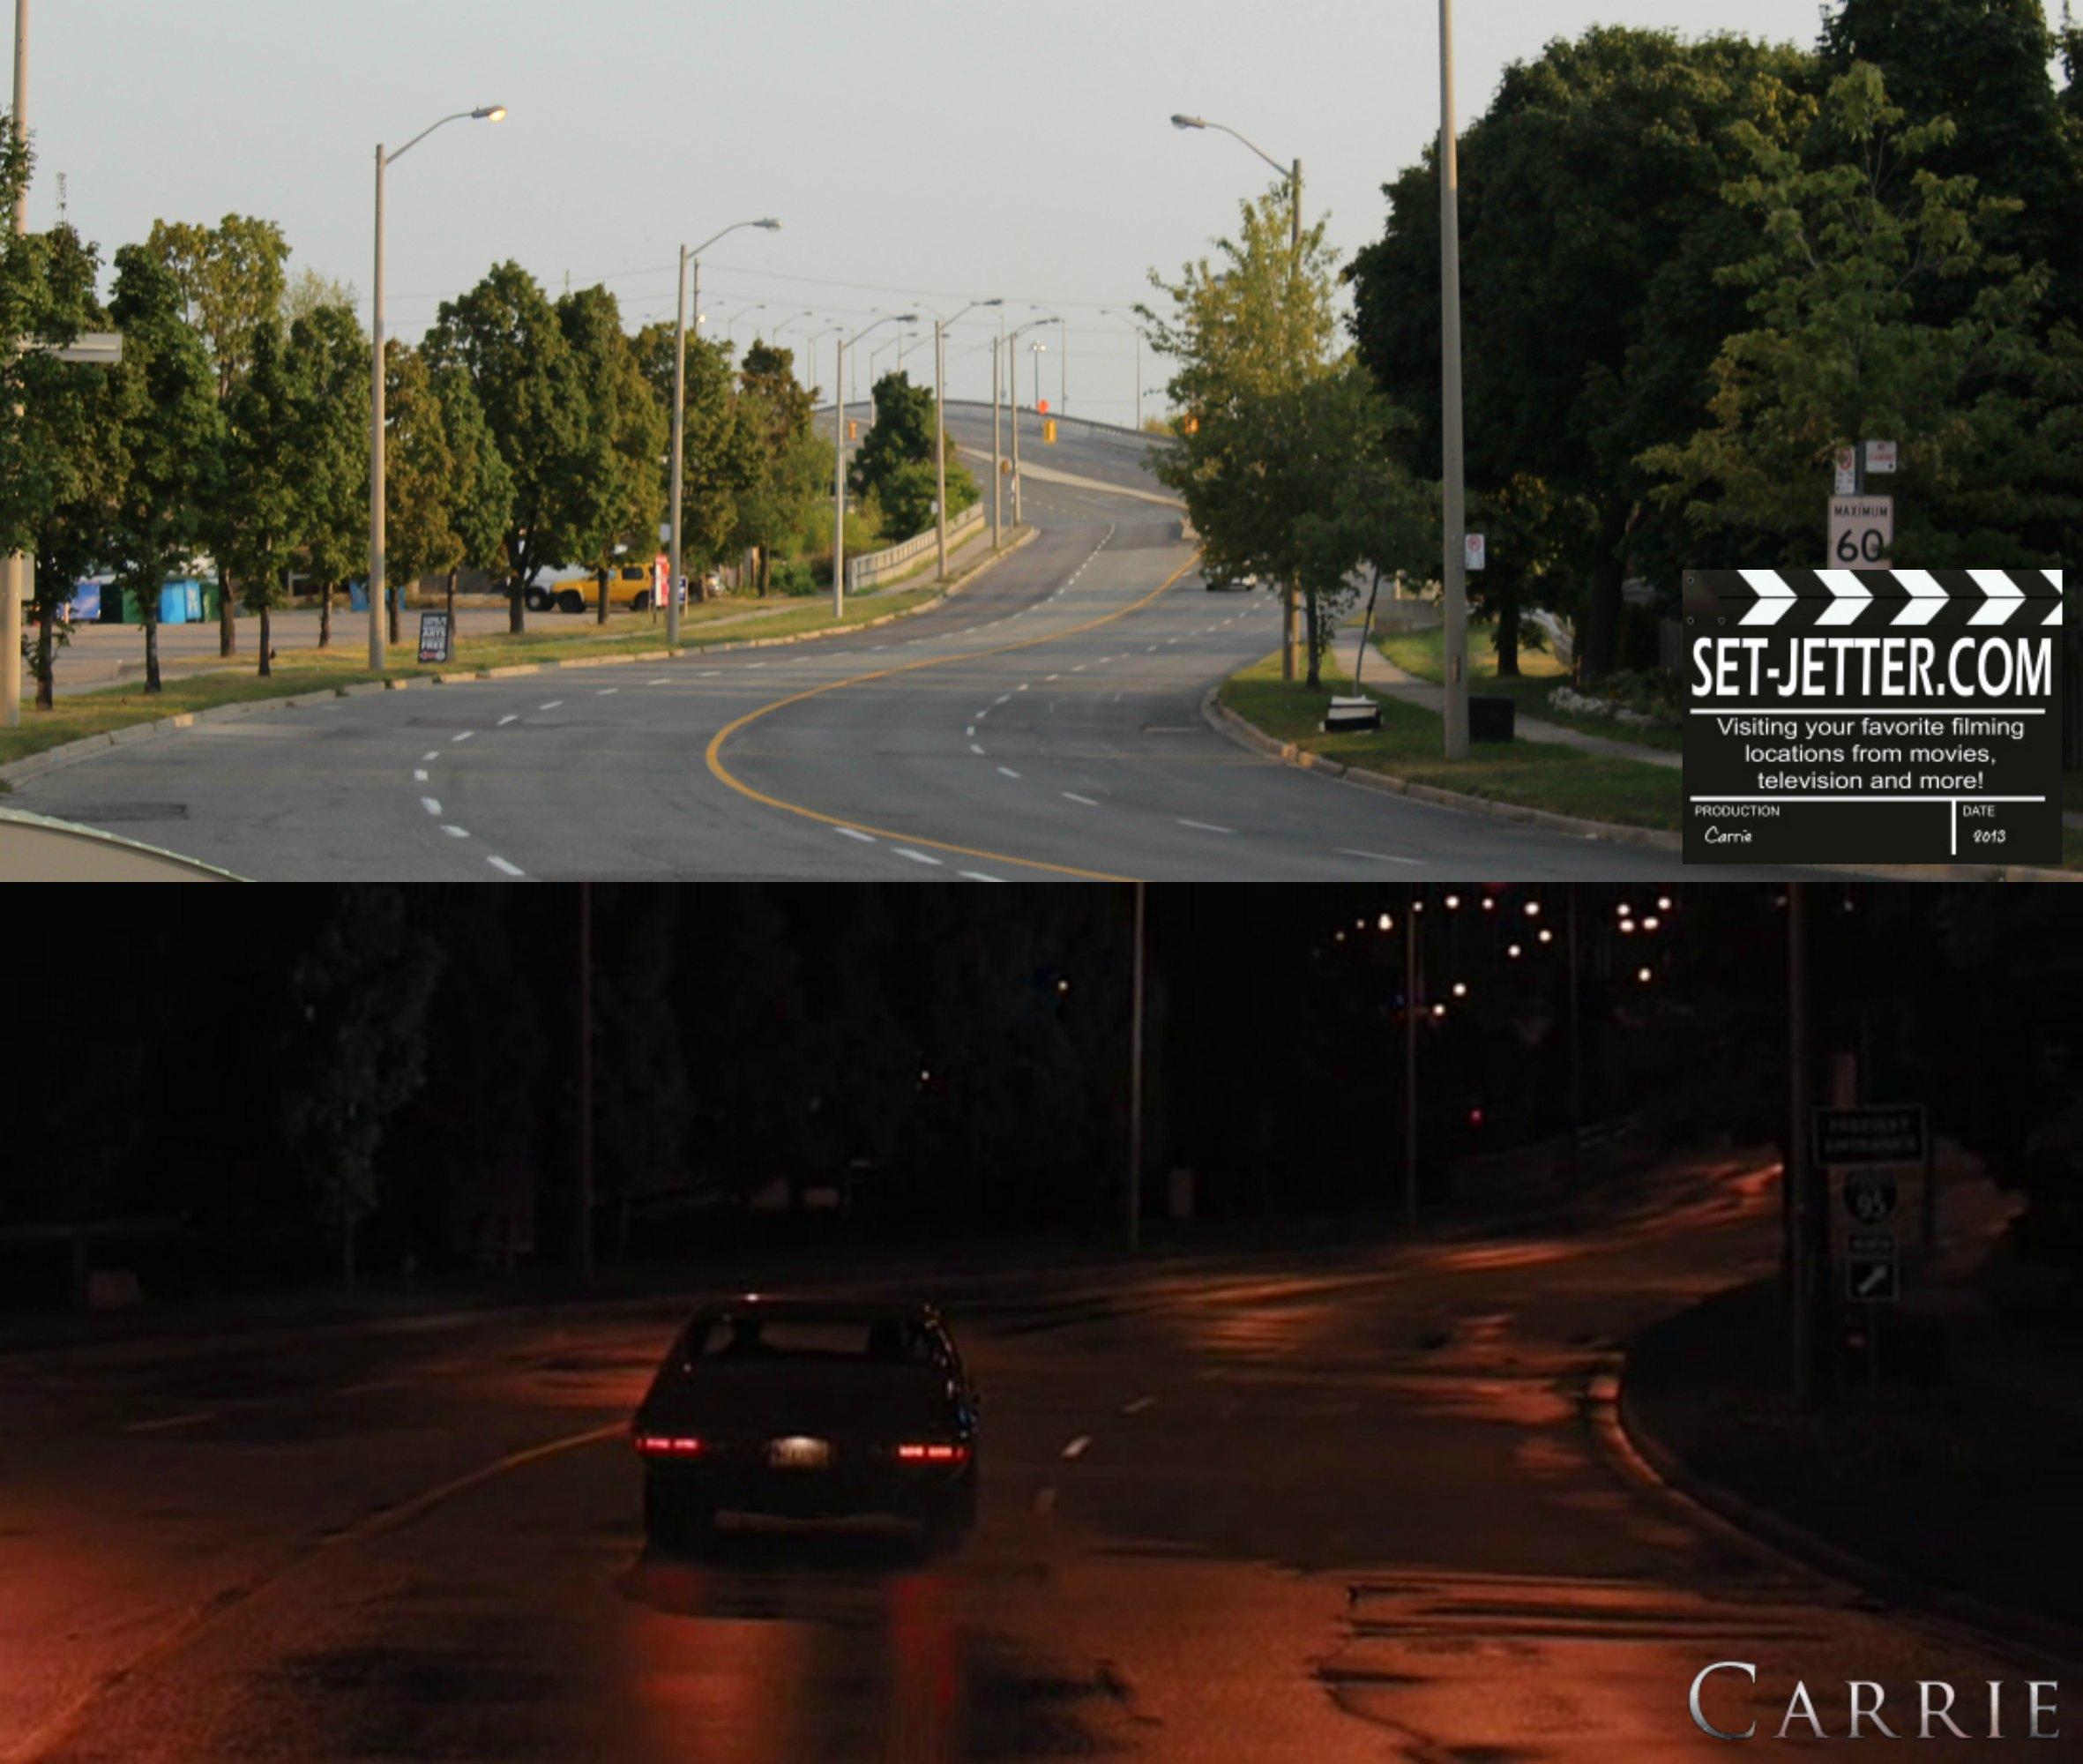 Carrie 2013 comparison 168.jpg